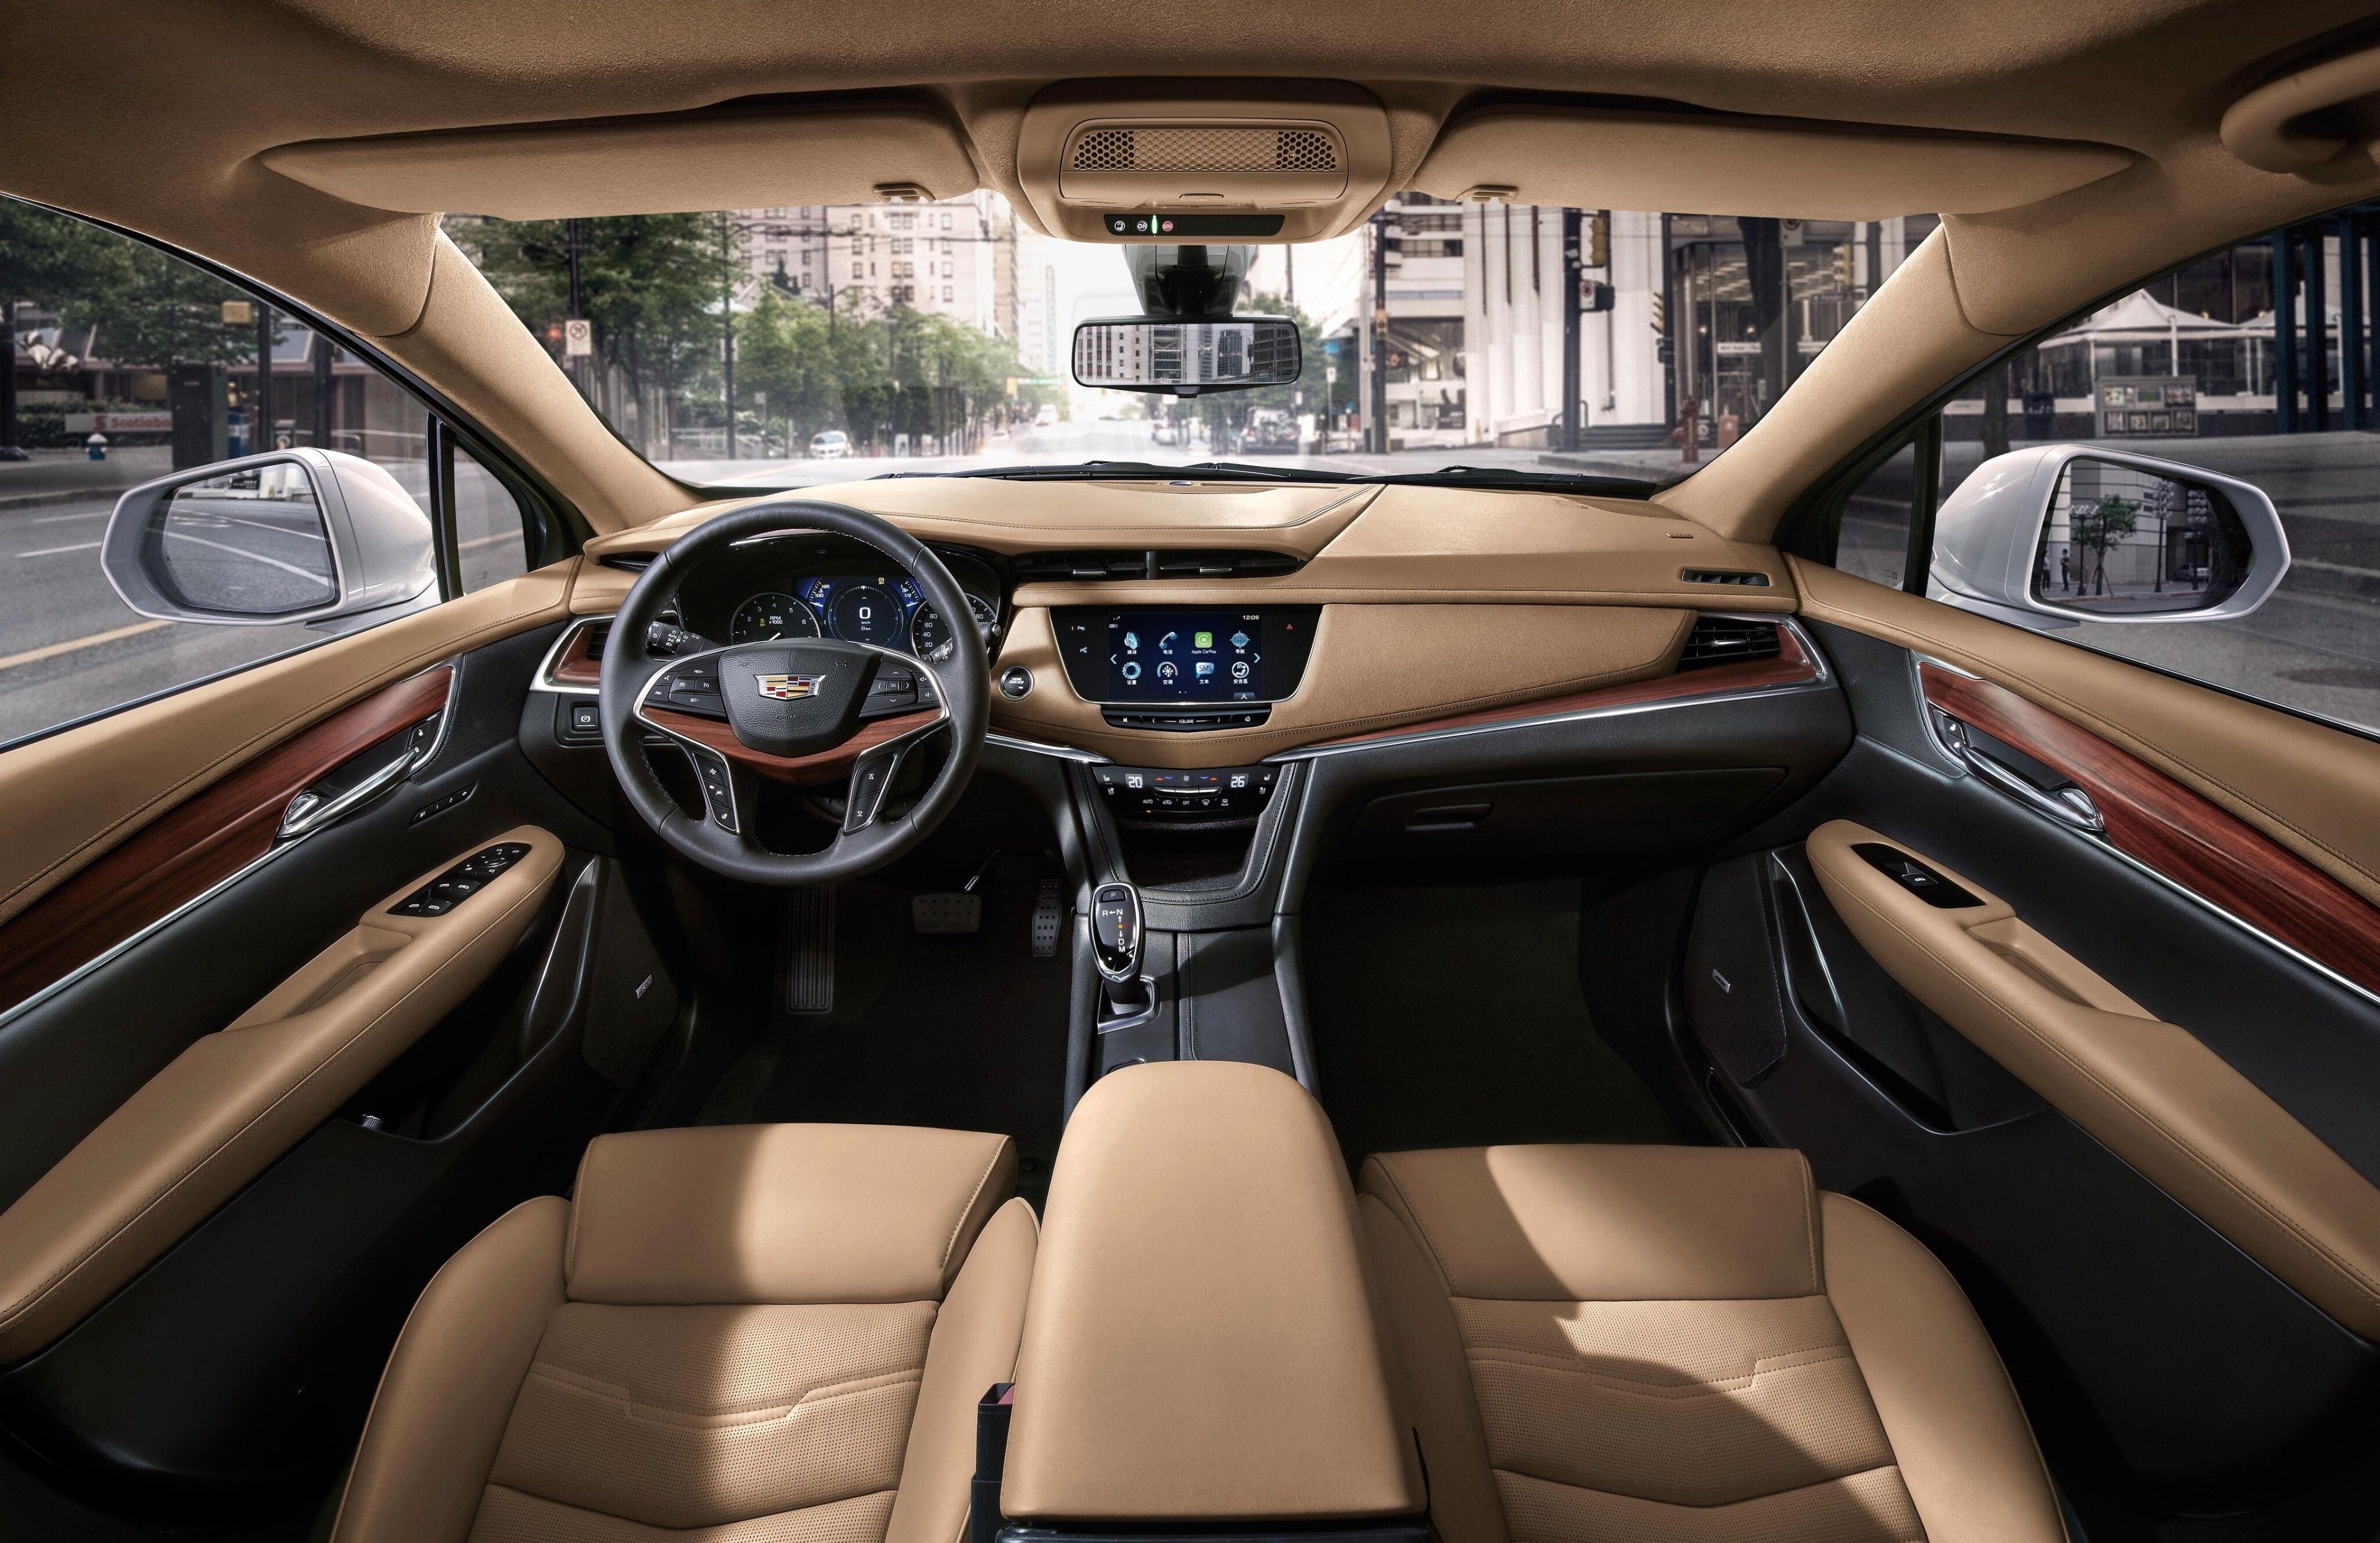 2019 Cadillac XT5: Expectations, Specs, Price >> 3840x2489 Cadillac Xt5 4k Wallpaper Theme Cars Cadillac